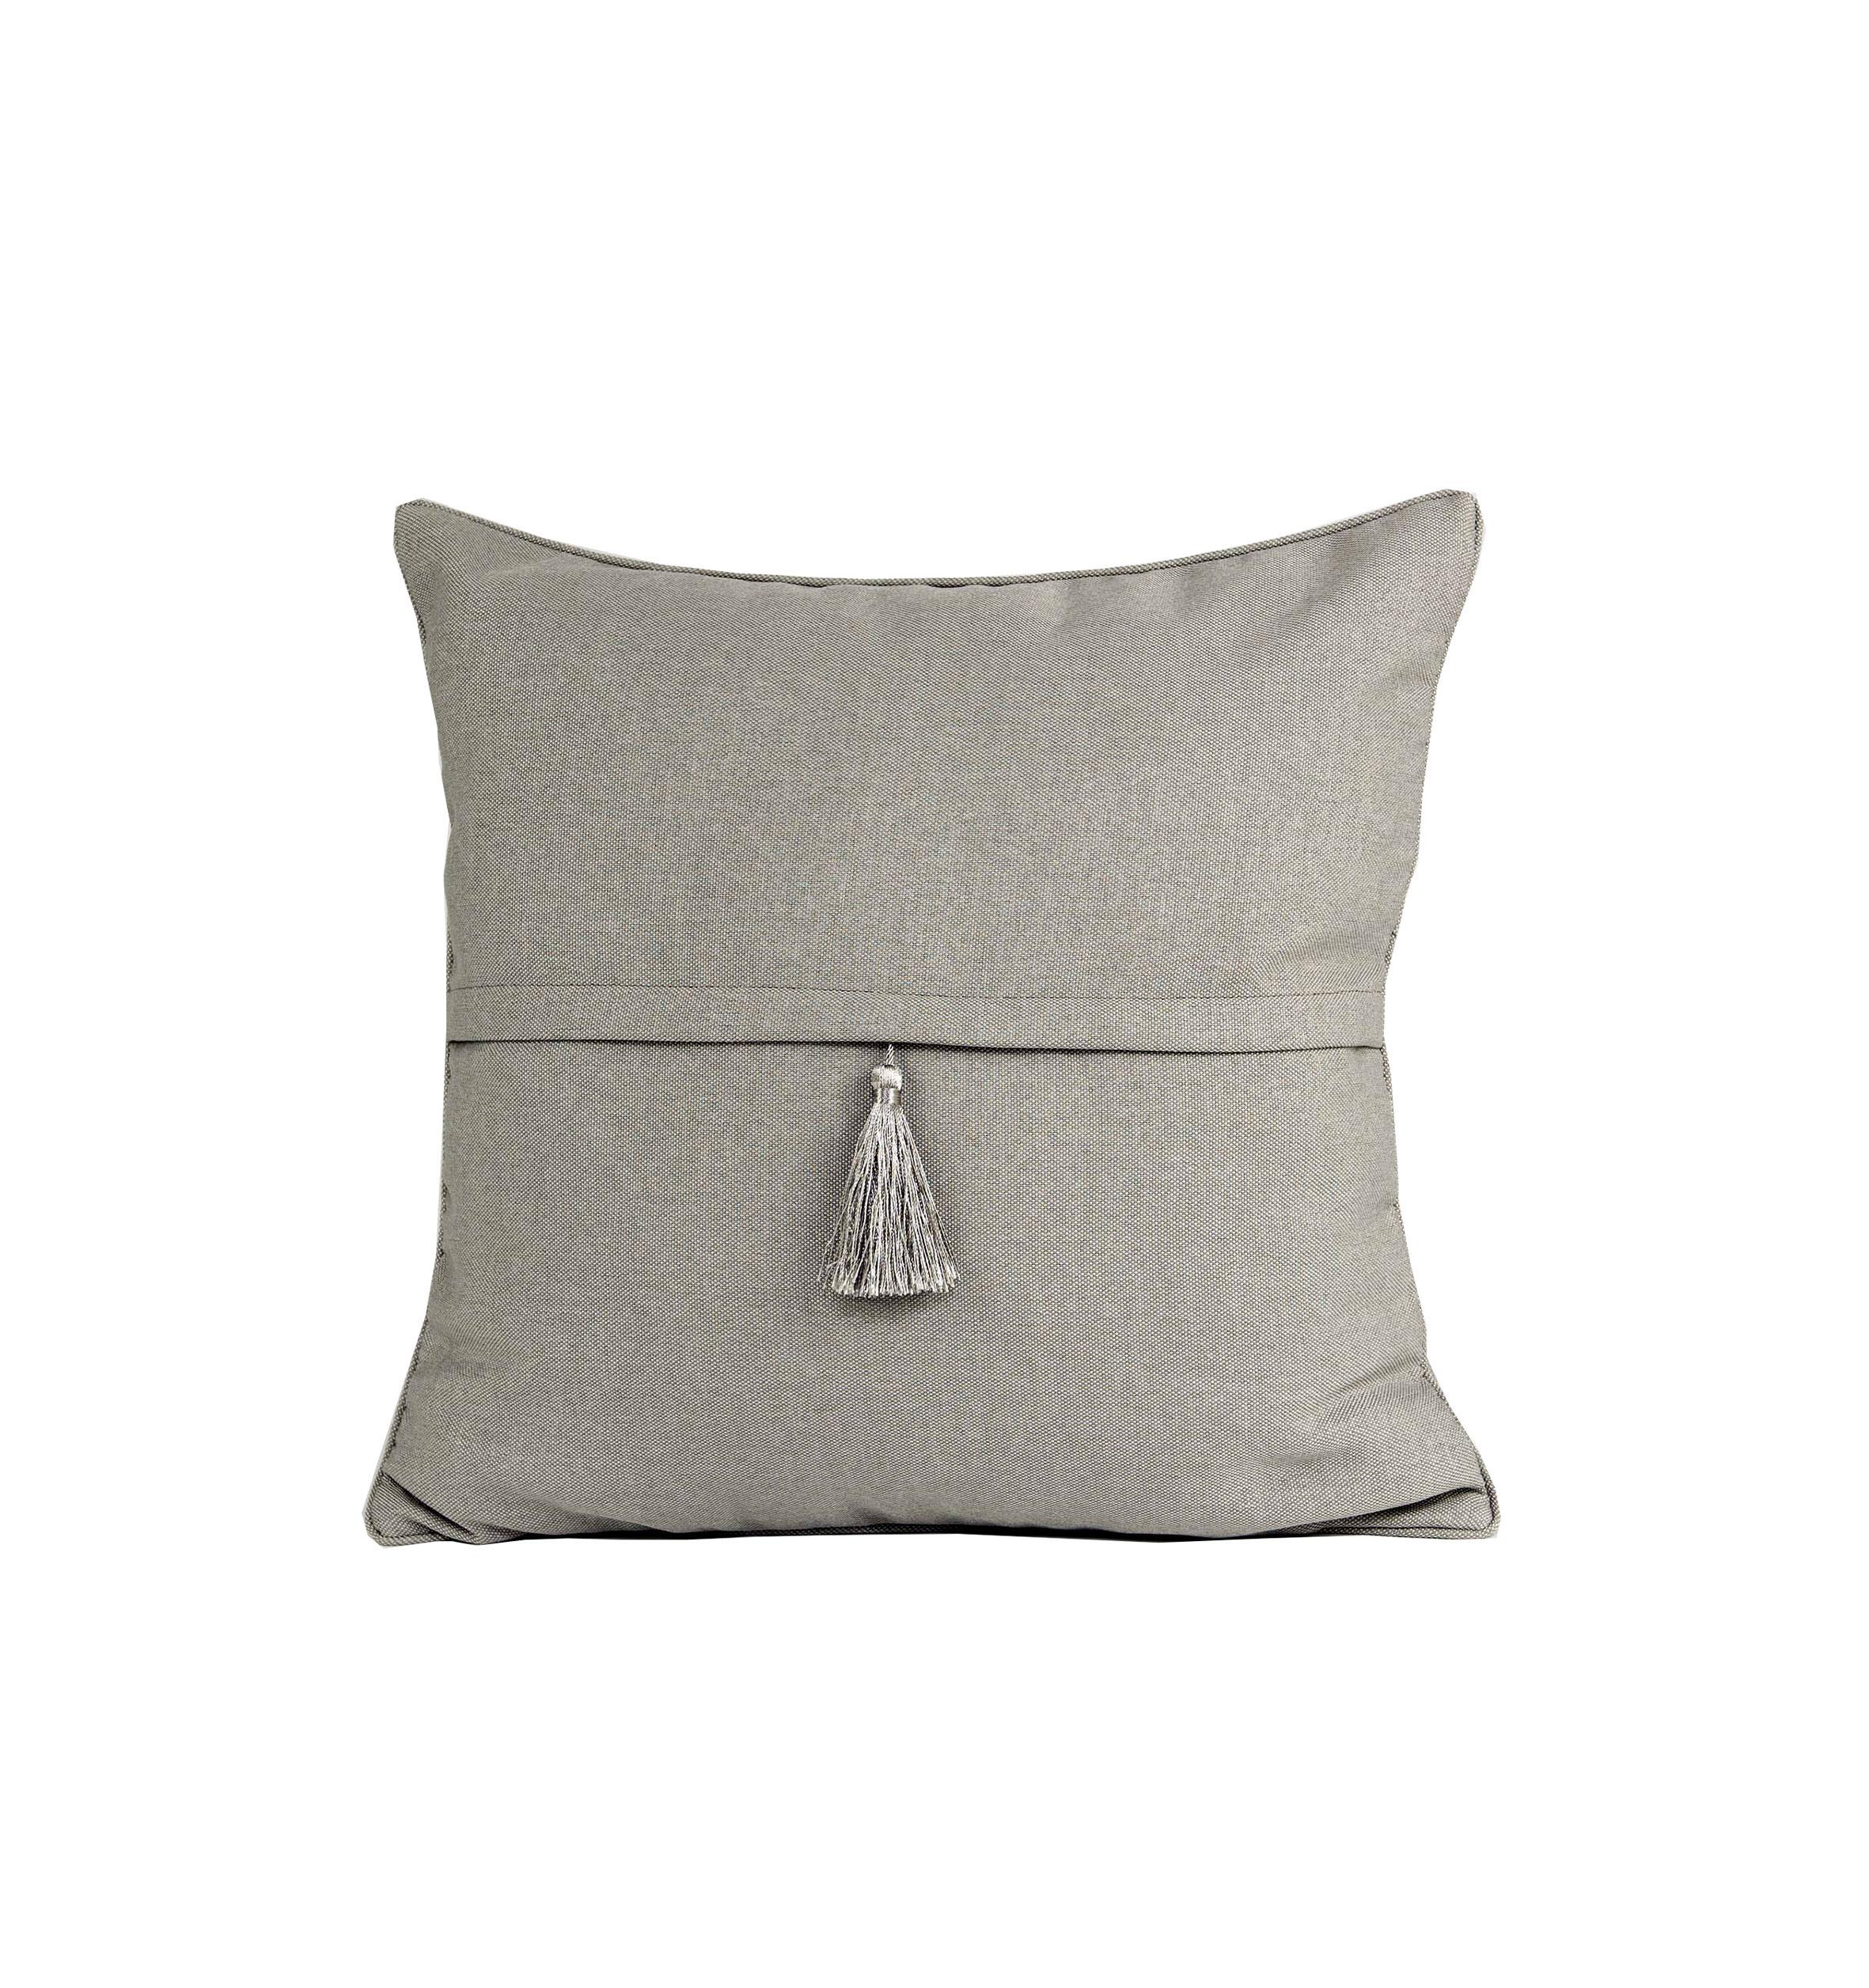 dekokissen barbados 50x50 cm vapor inklusive f llkissen. Black Bedroom Furniture Sets. Home Design Ideas